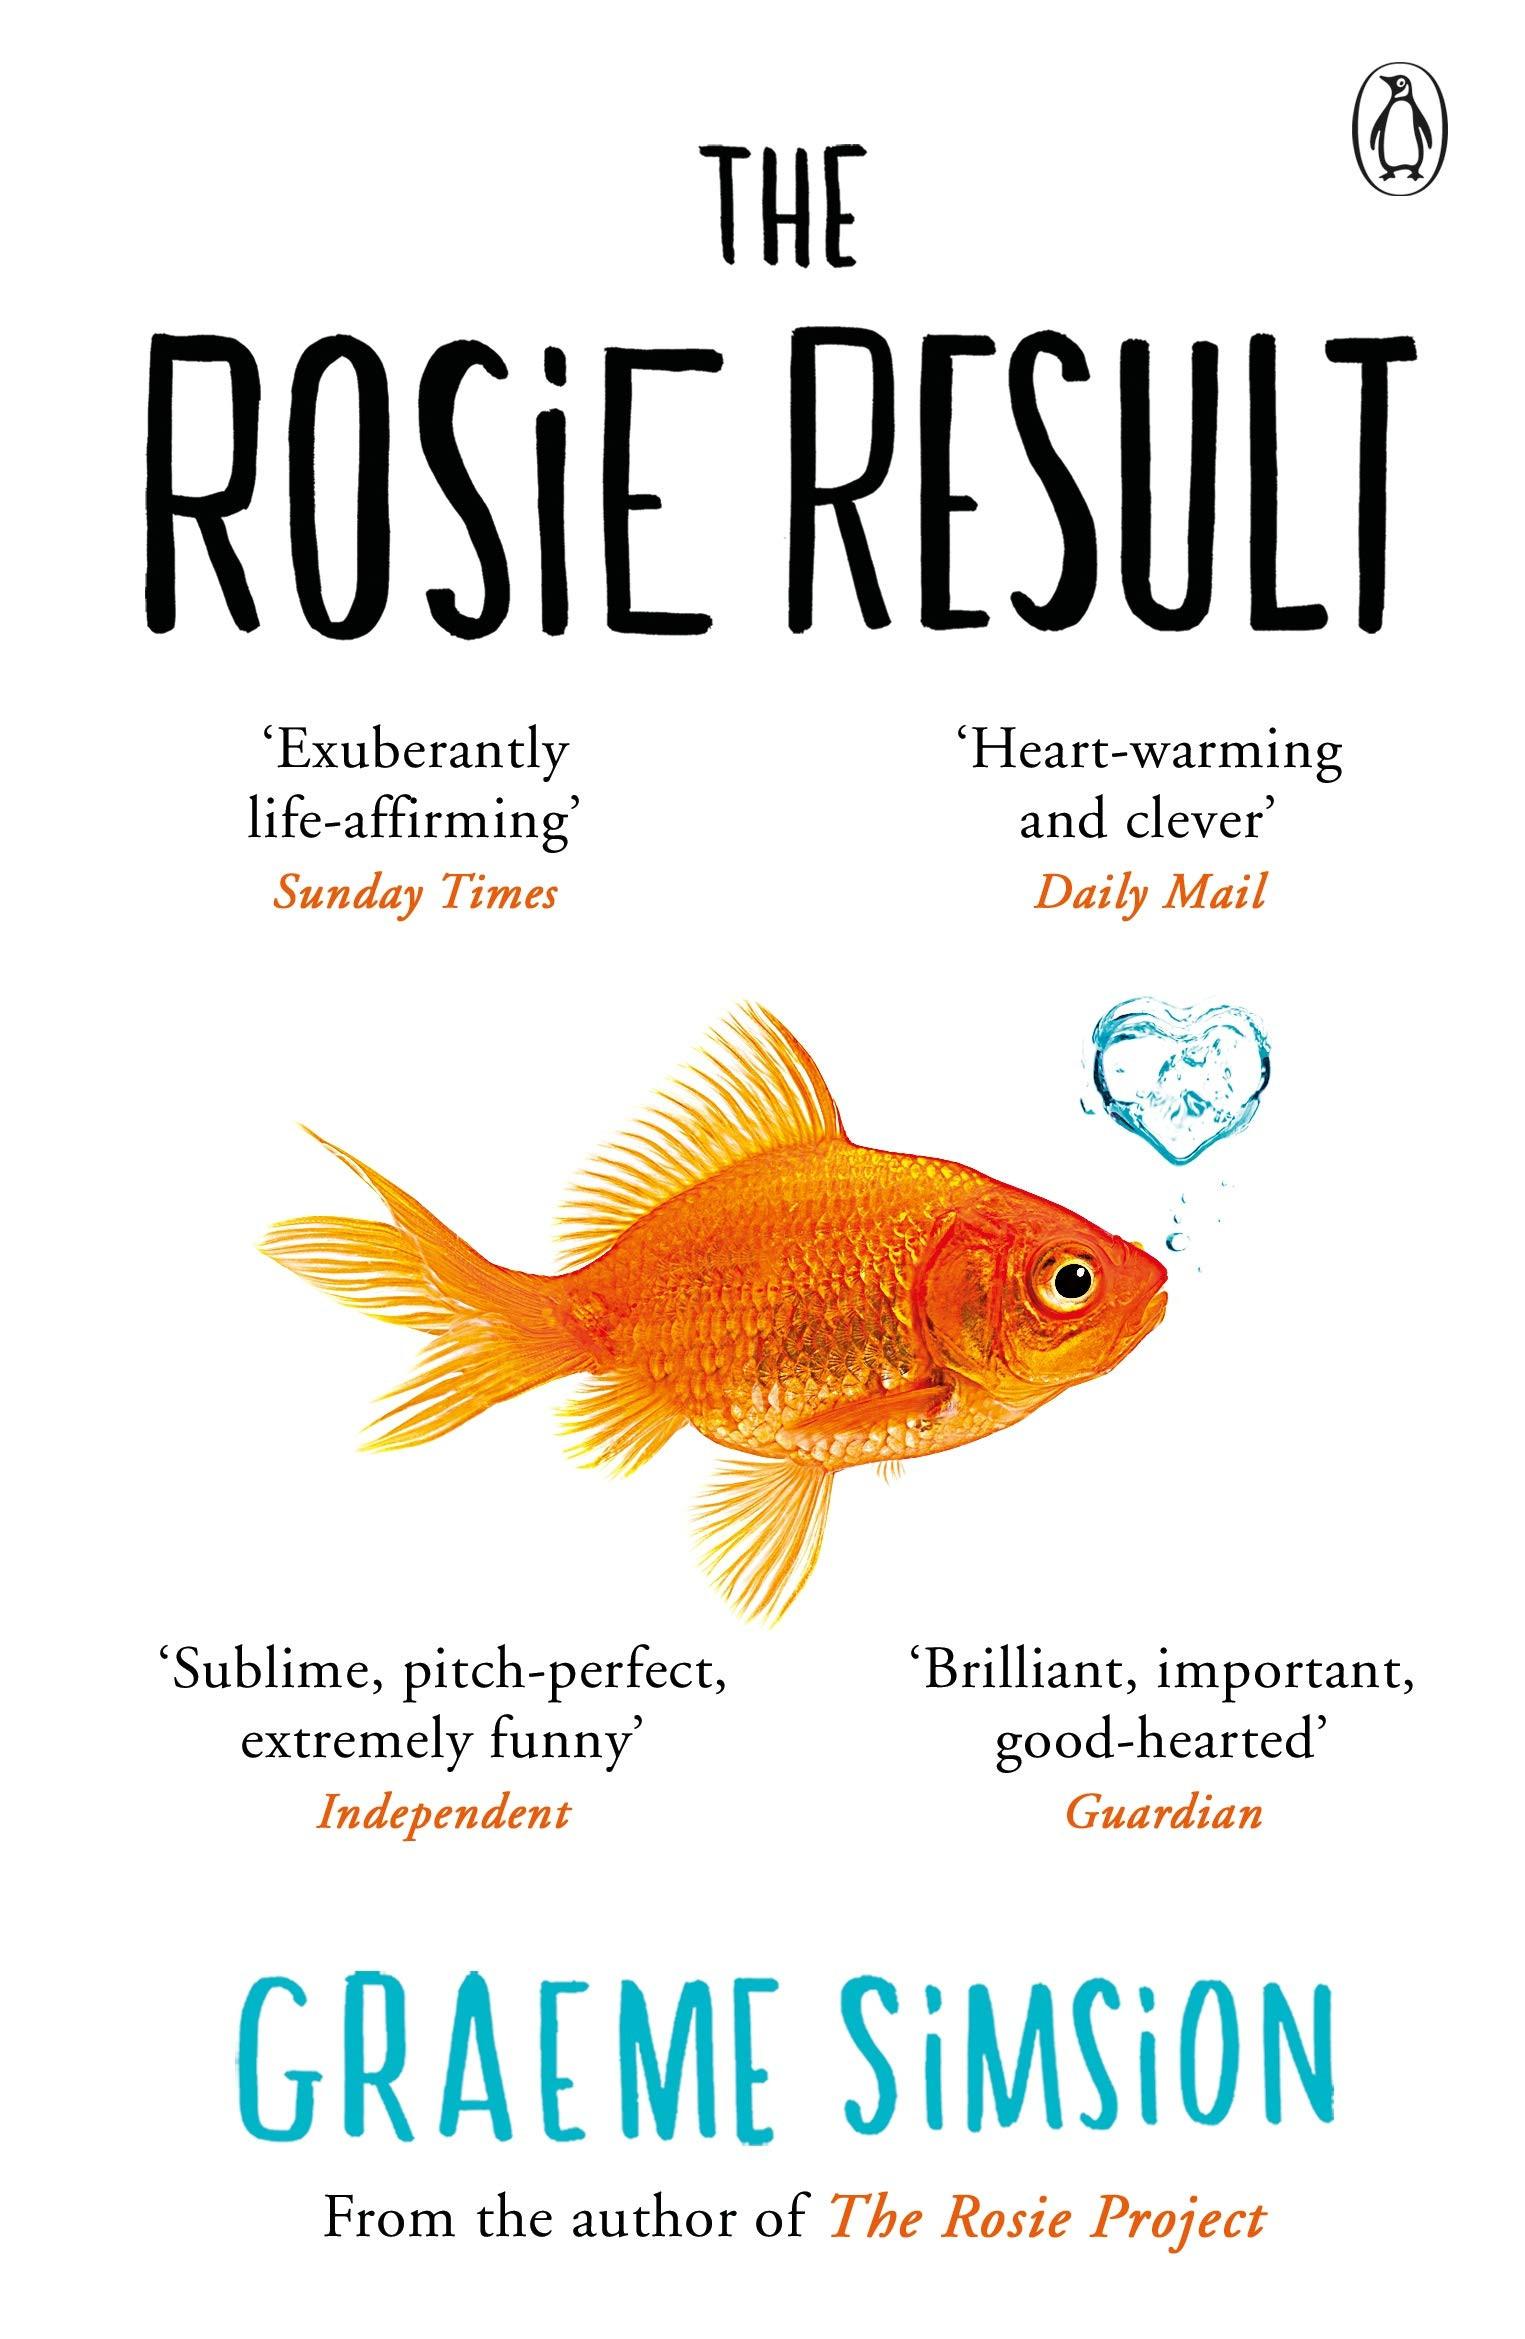 Graeme Simsion - The Rosie Result